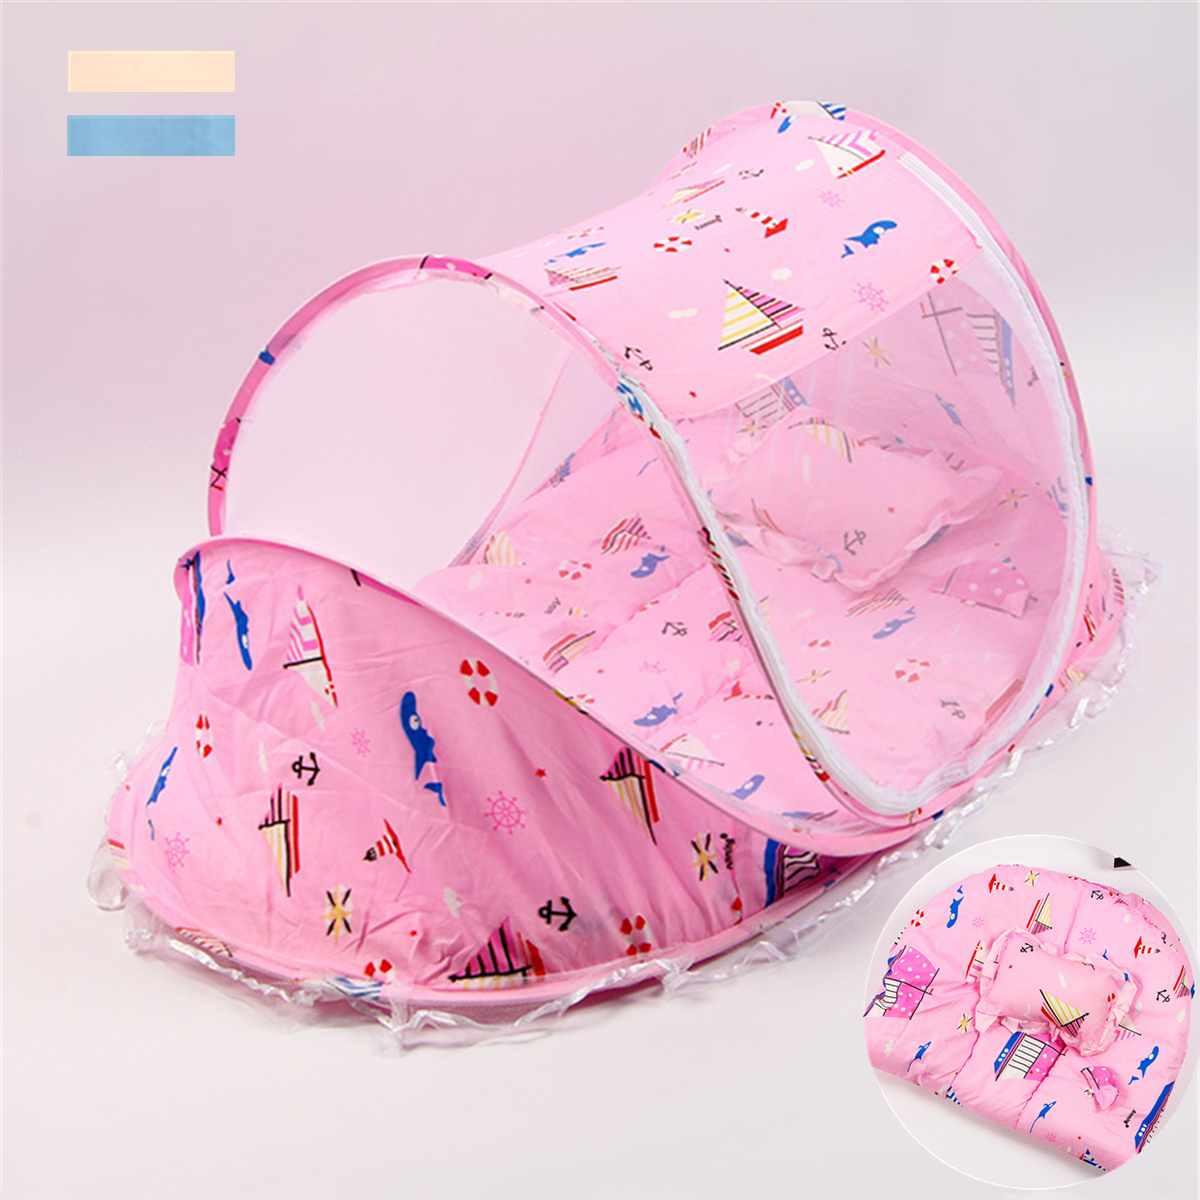 3 Stks/set Baby Crib Sets Klamboe Draagbare Vouwen Soort Baby Pad Beddengoed Baby Insect Netting Kussen Matras Baby Kussen